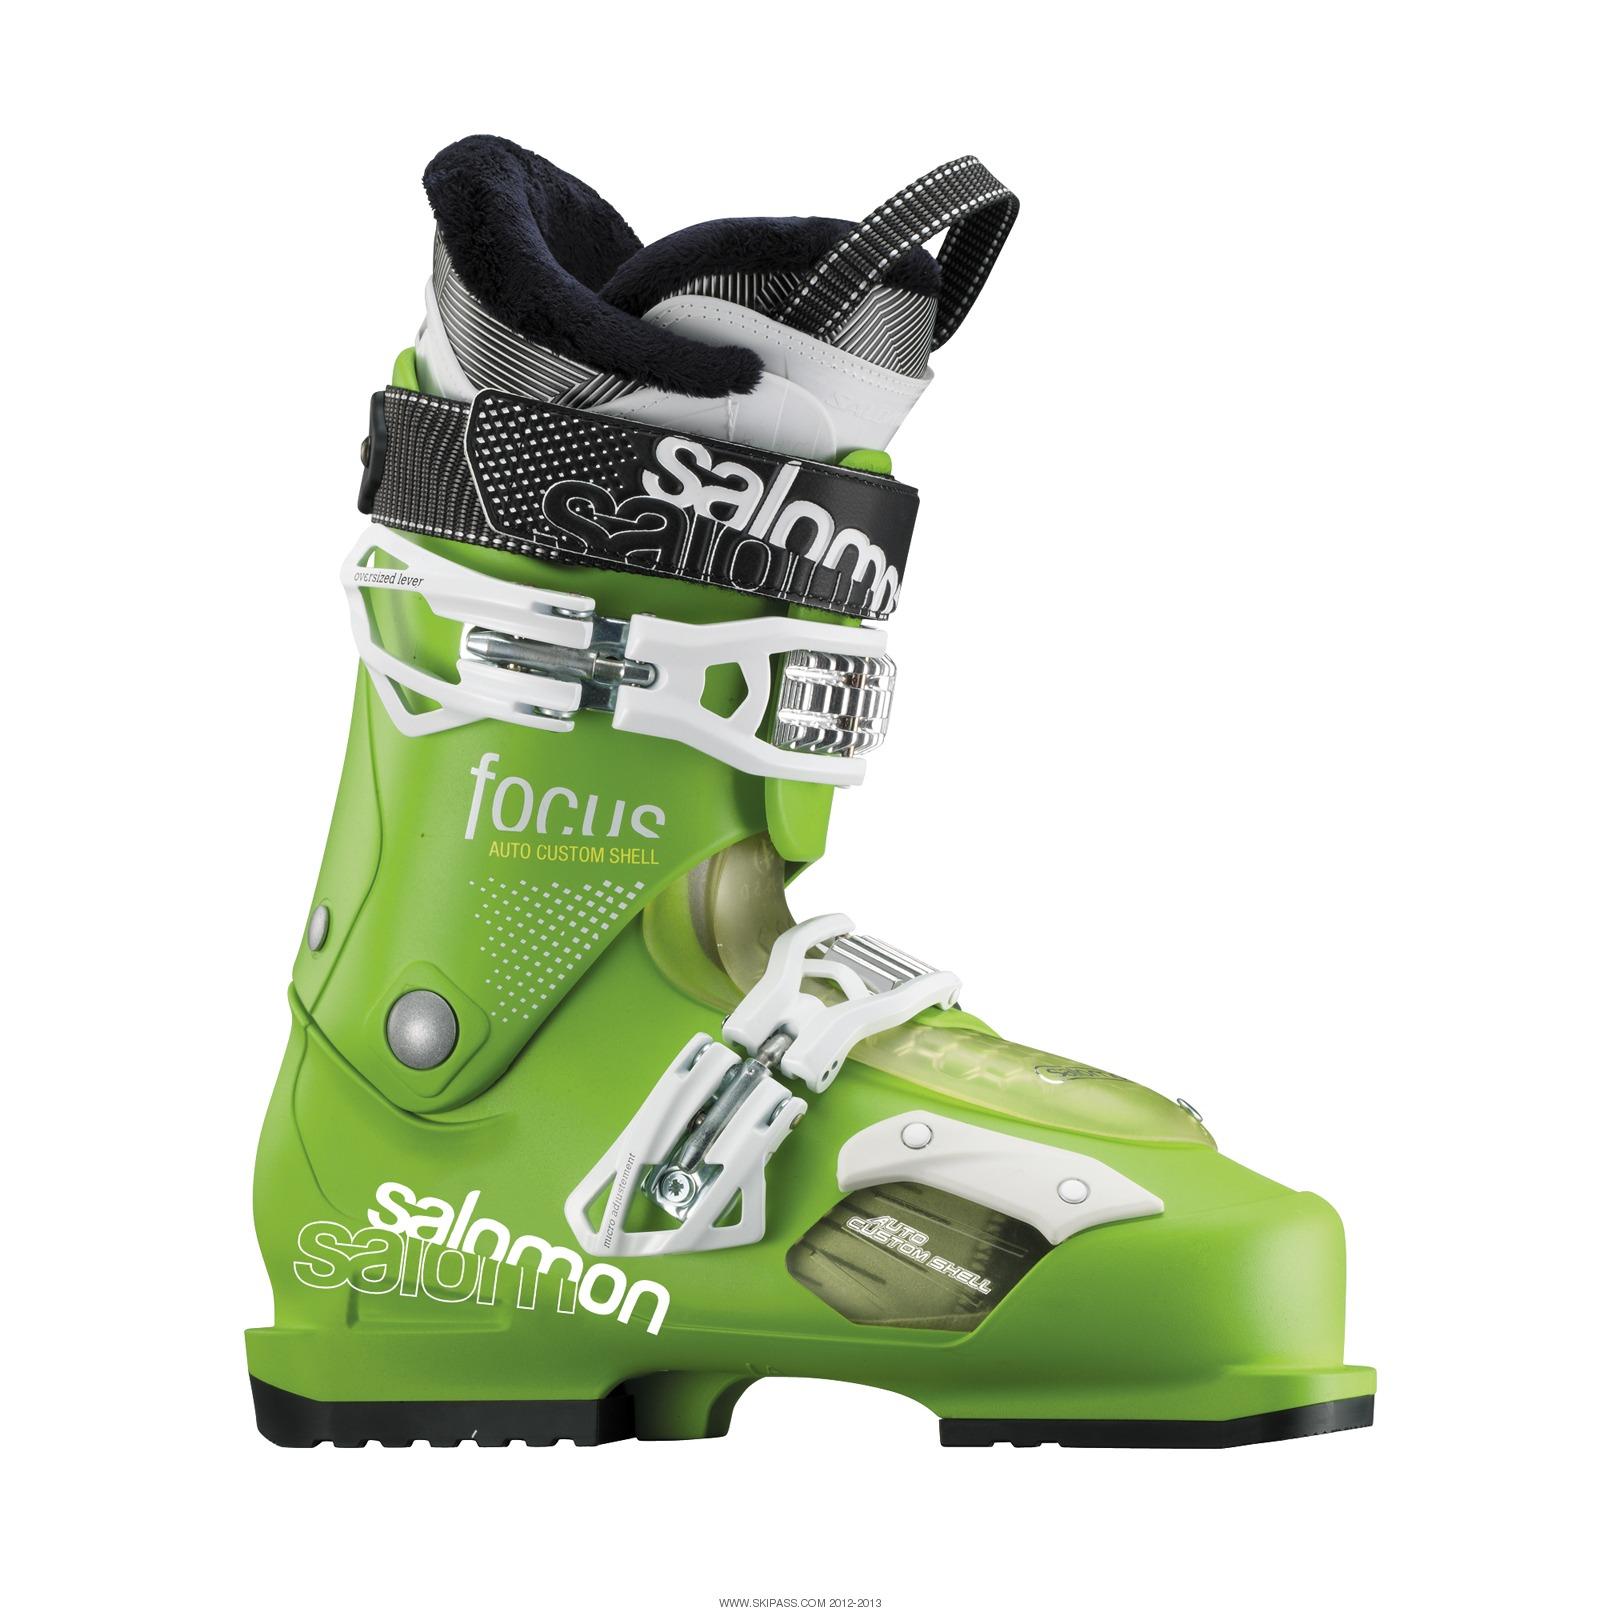 Chaussure Rossignol Ou Avis Ski Salomon 0wmOvNn8